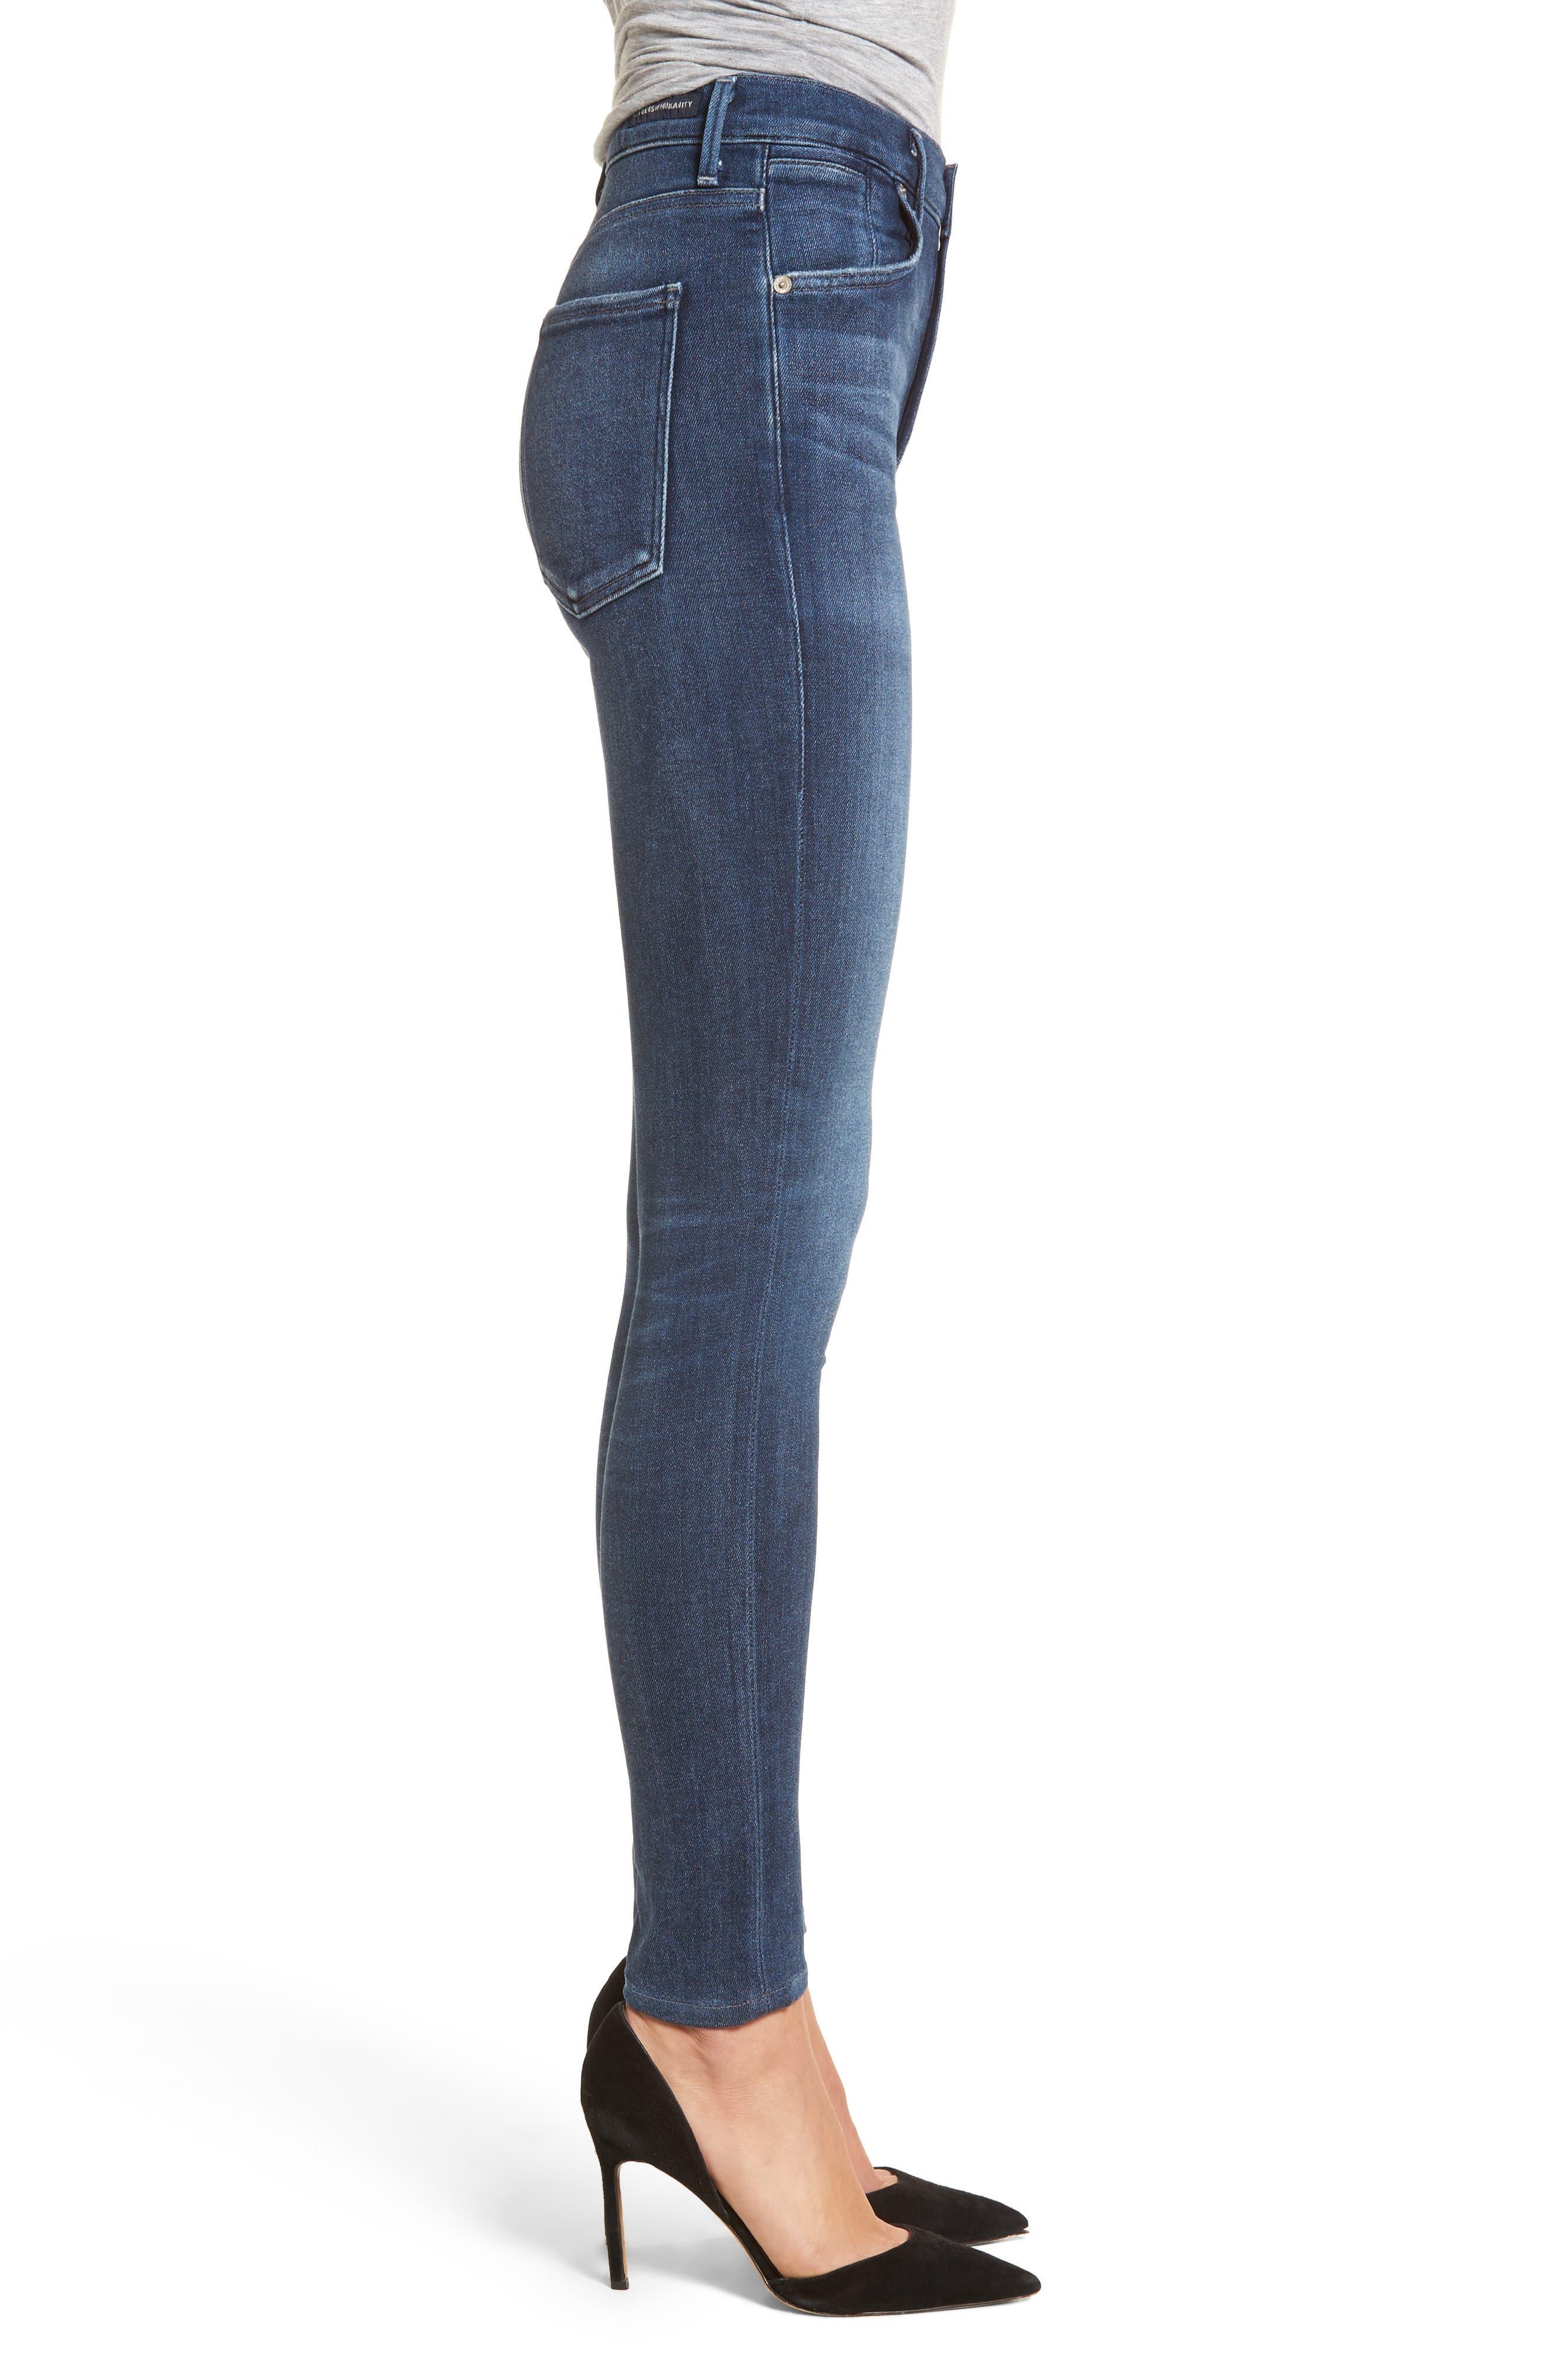 Emma Power Legging Jeans,                             Alternate thumbnail 3, color,                             425